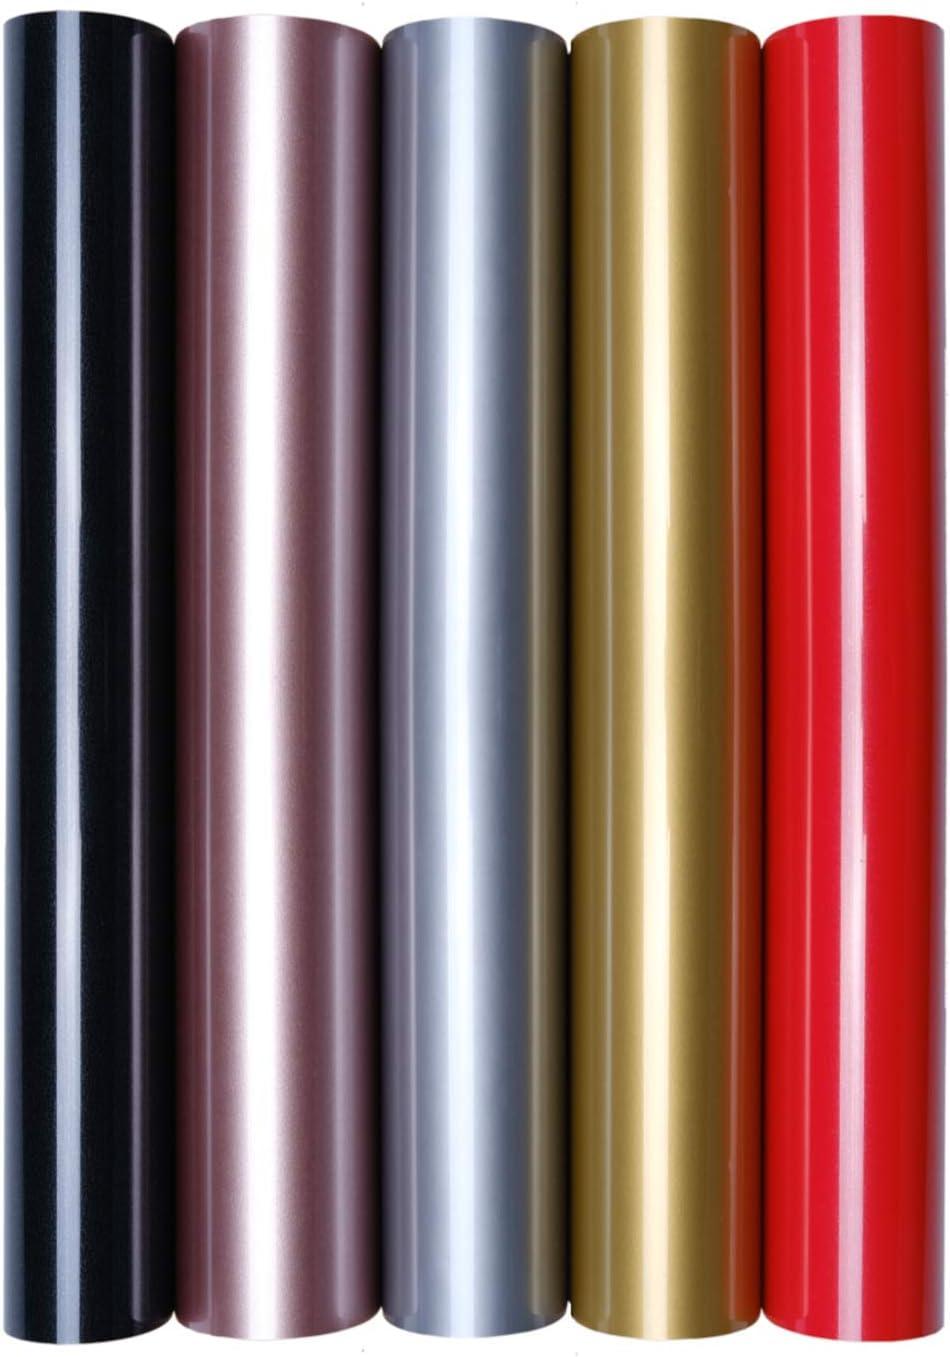 5 láminas de transferencia A4 para planchar sobre textiles, perfectas para plotter, P.S. Film:5er Set Glimmer: Amazon.es: Oficina y papelería